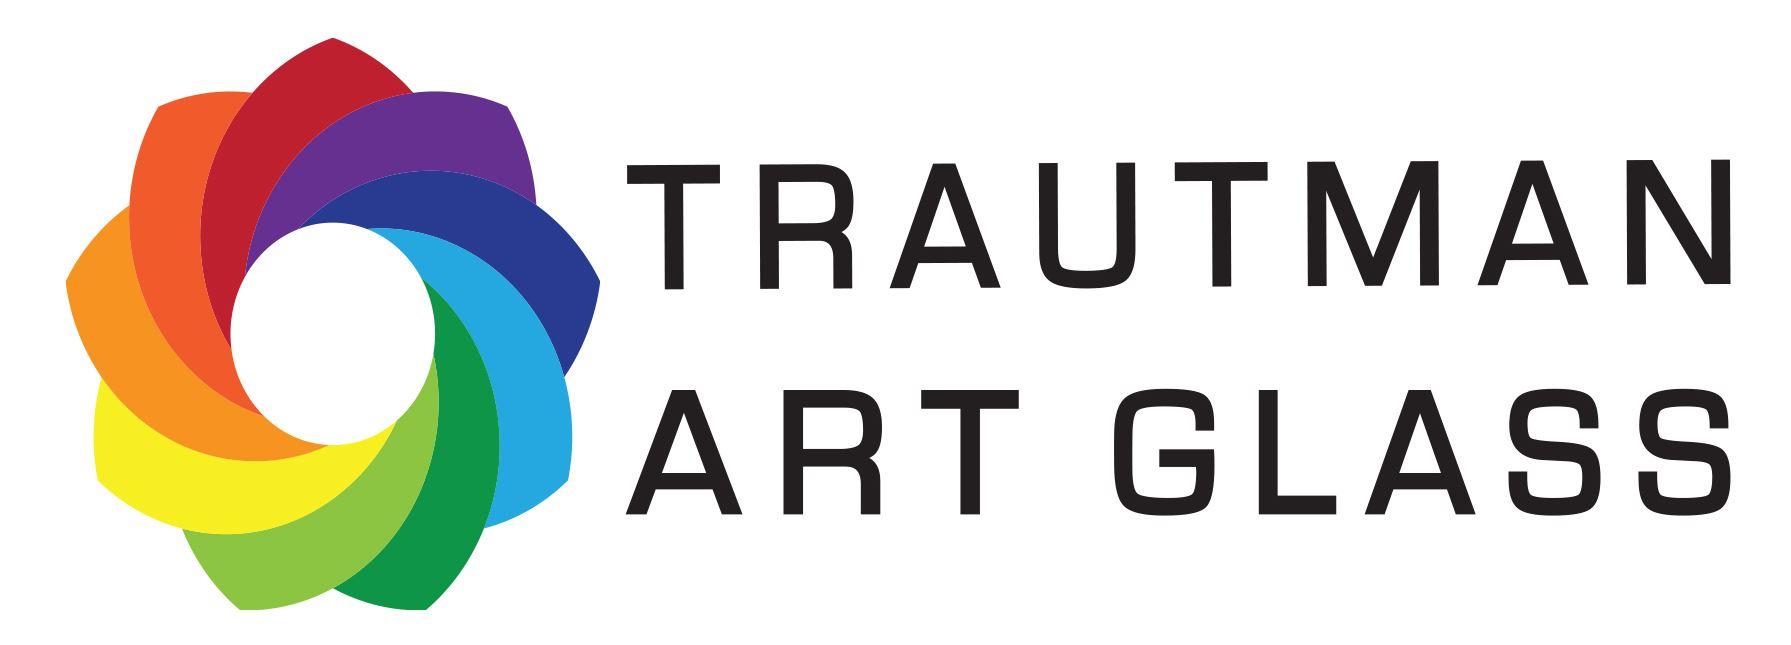 Trautman Art Glass Logo